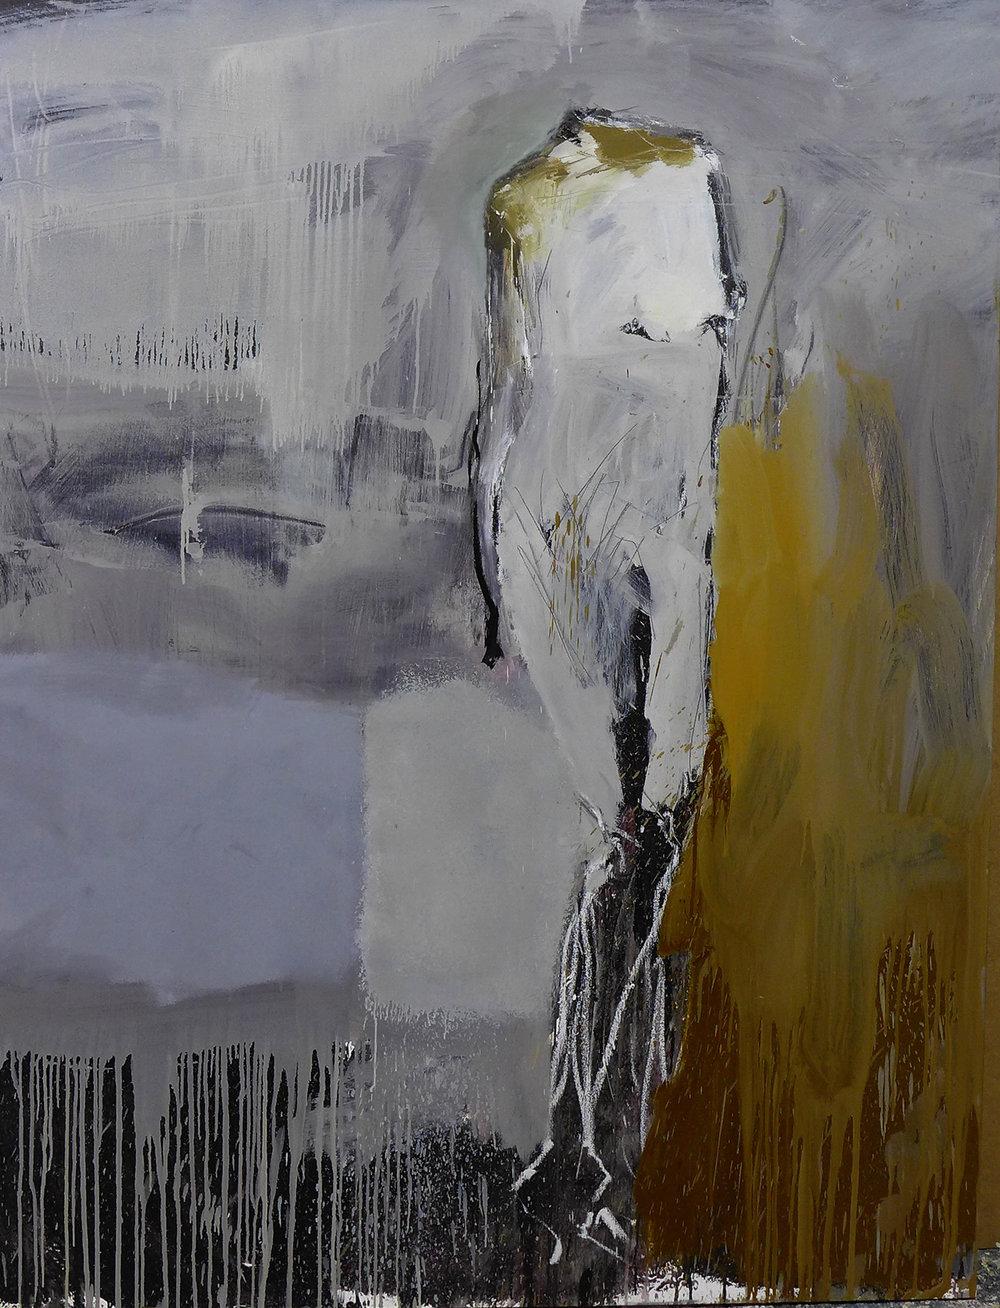 Mujer sin nombre, 2016 Óleo sobre lienzo 170 x 130 cm